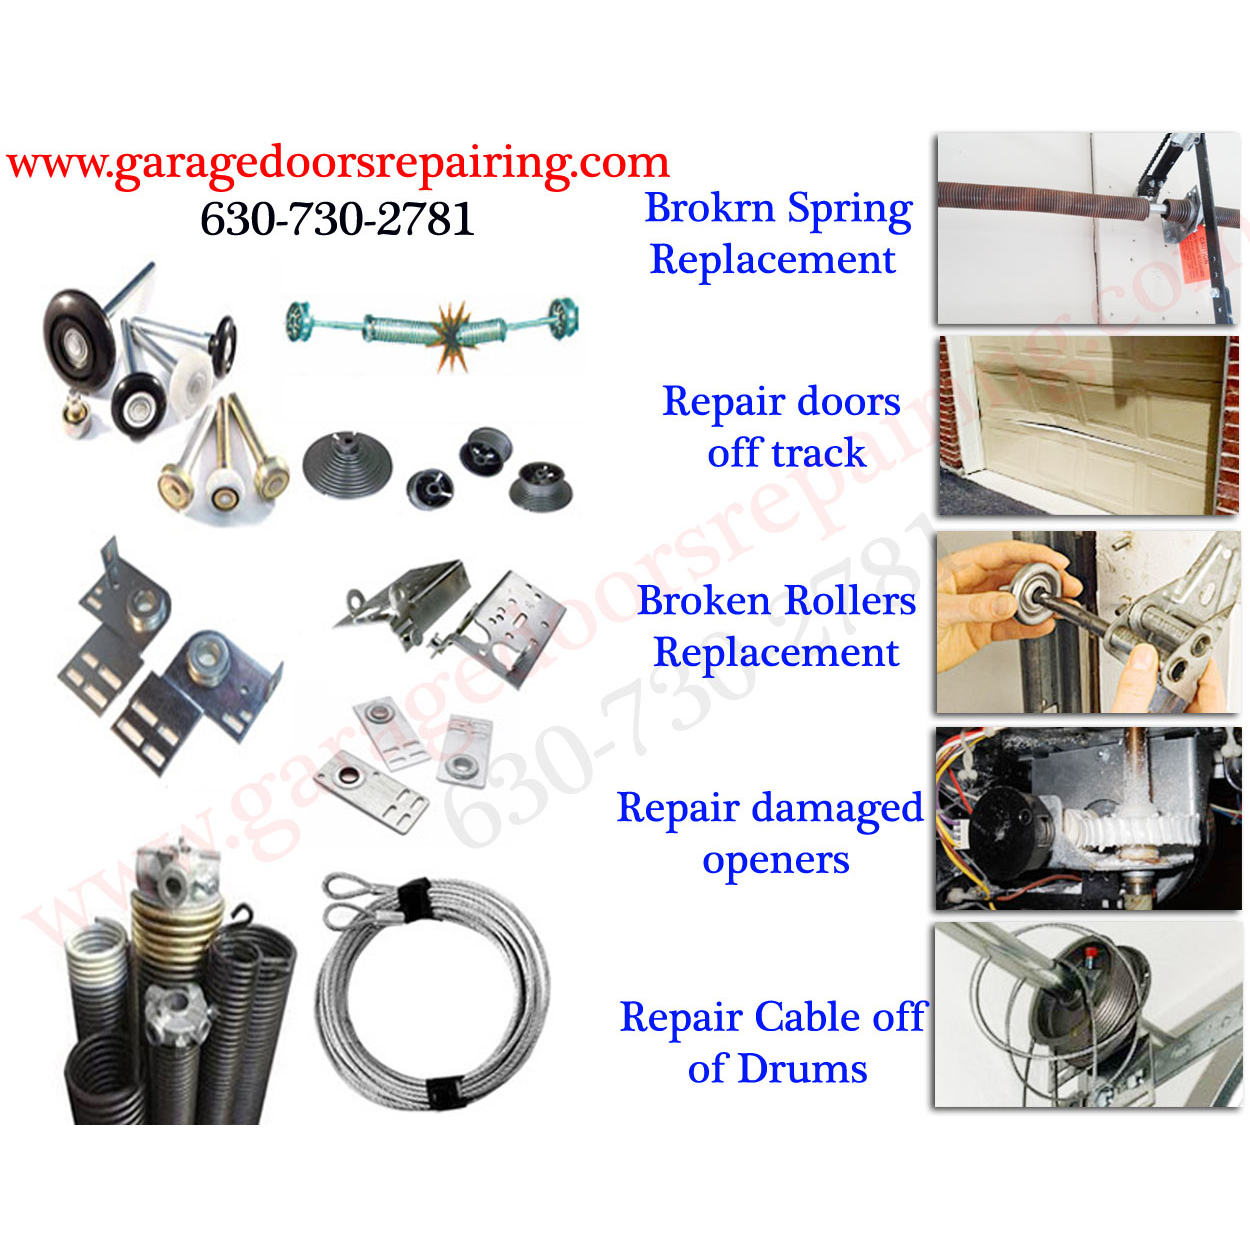 Garage Doors Repairing Inc.